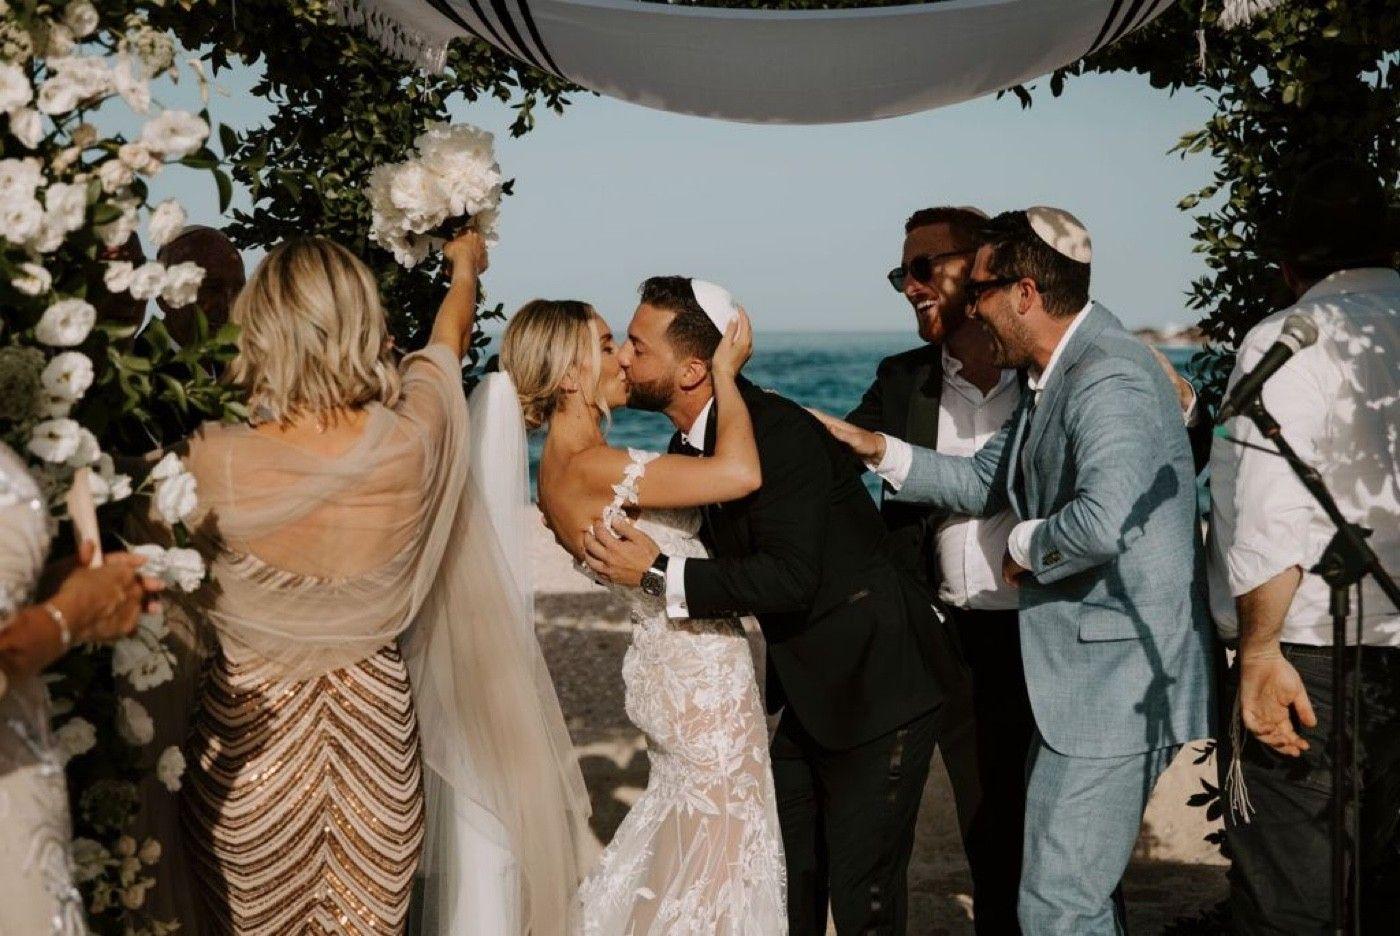 Noah, did we really photobomb the kiss!!